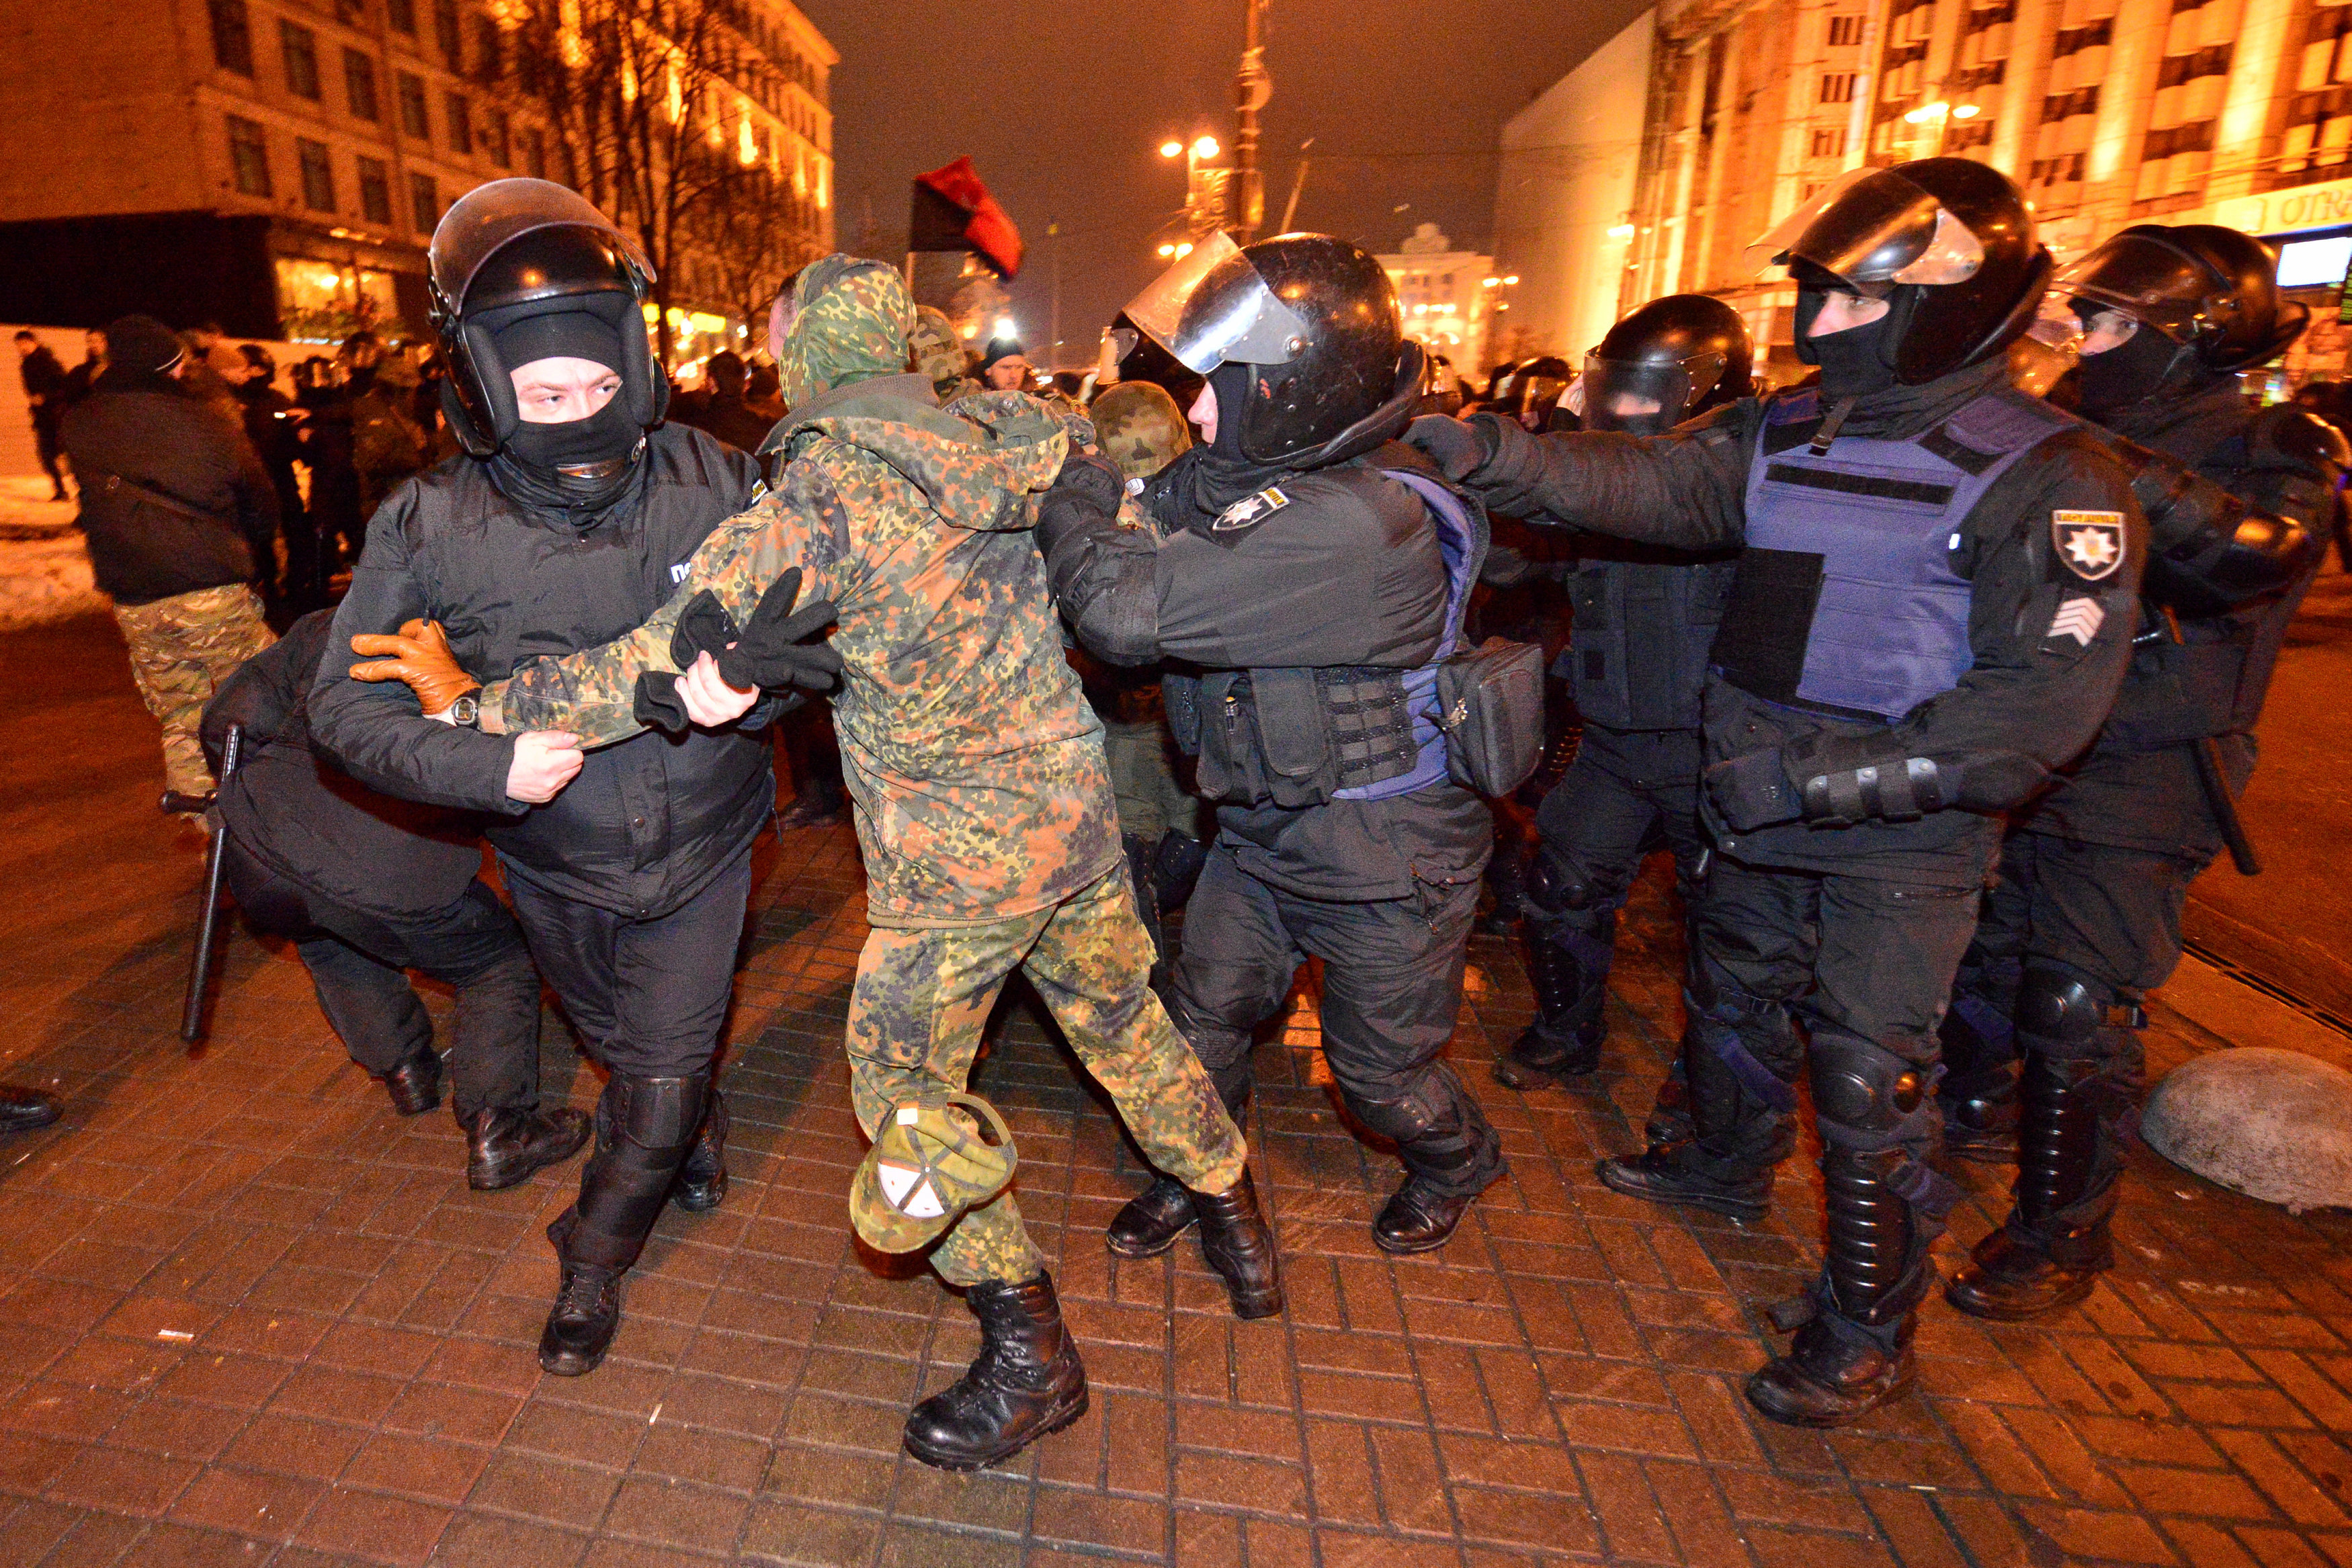 ВКиеве митингующие сломали пальцы сотруднице милиции